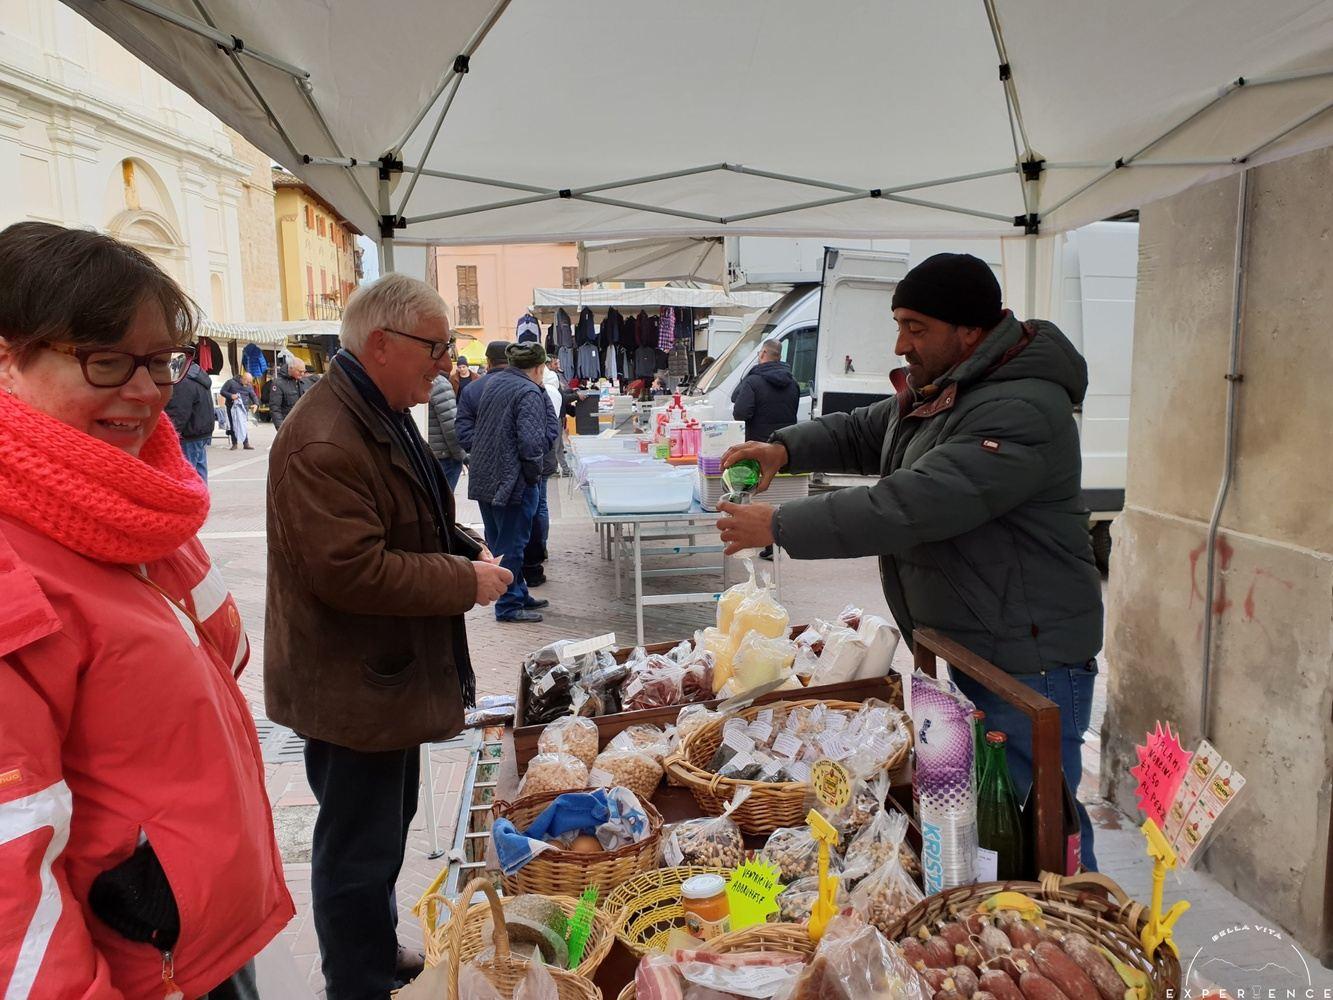 The Real Italian Experience | Food, Art & Nature in Abruzzo & Marche